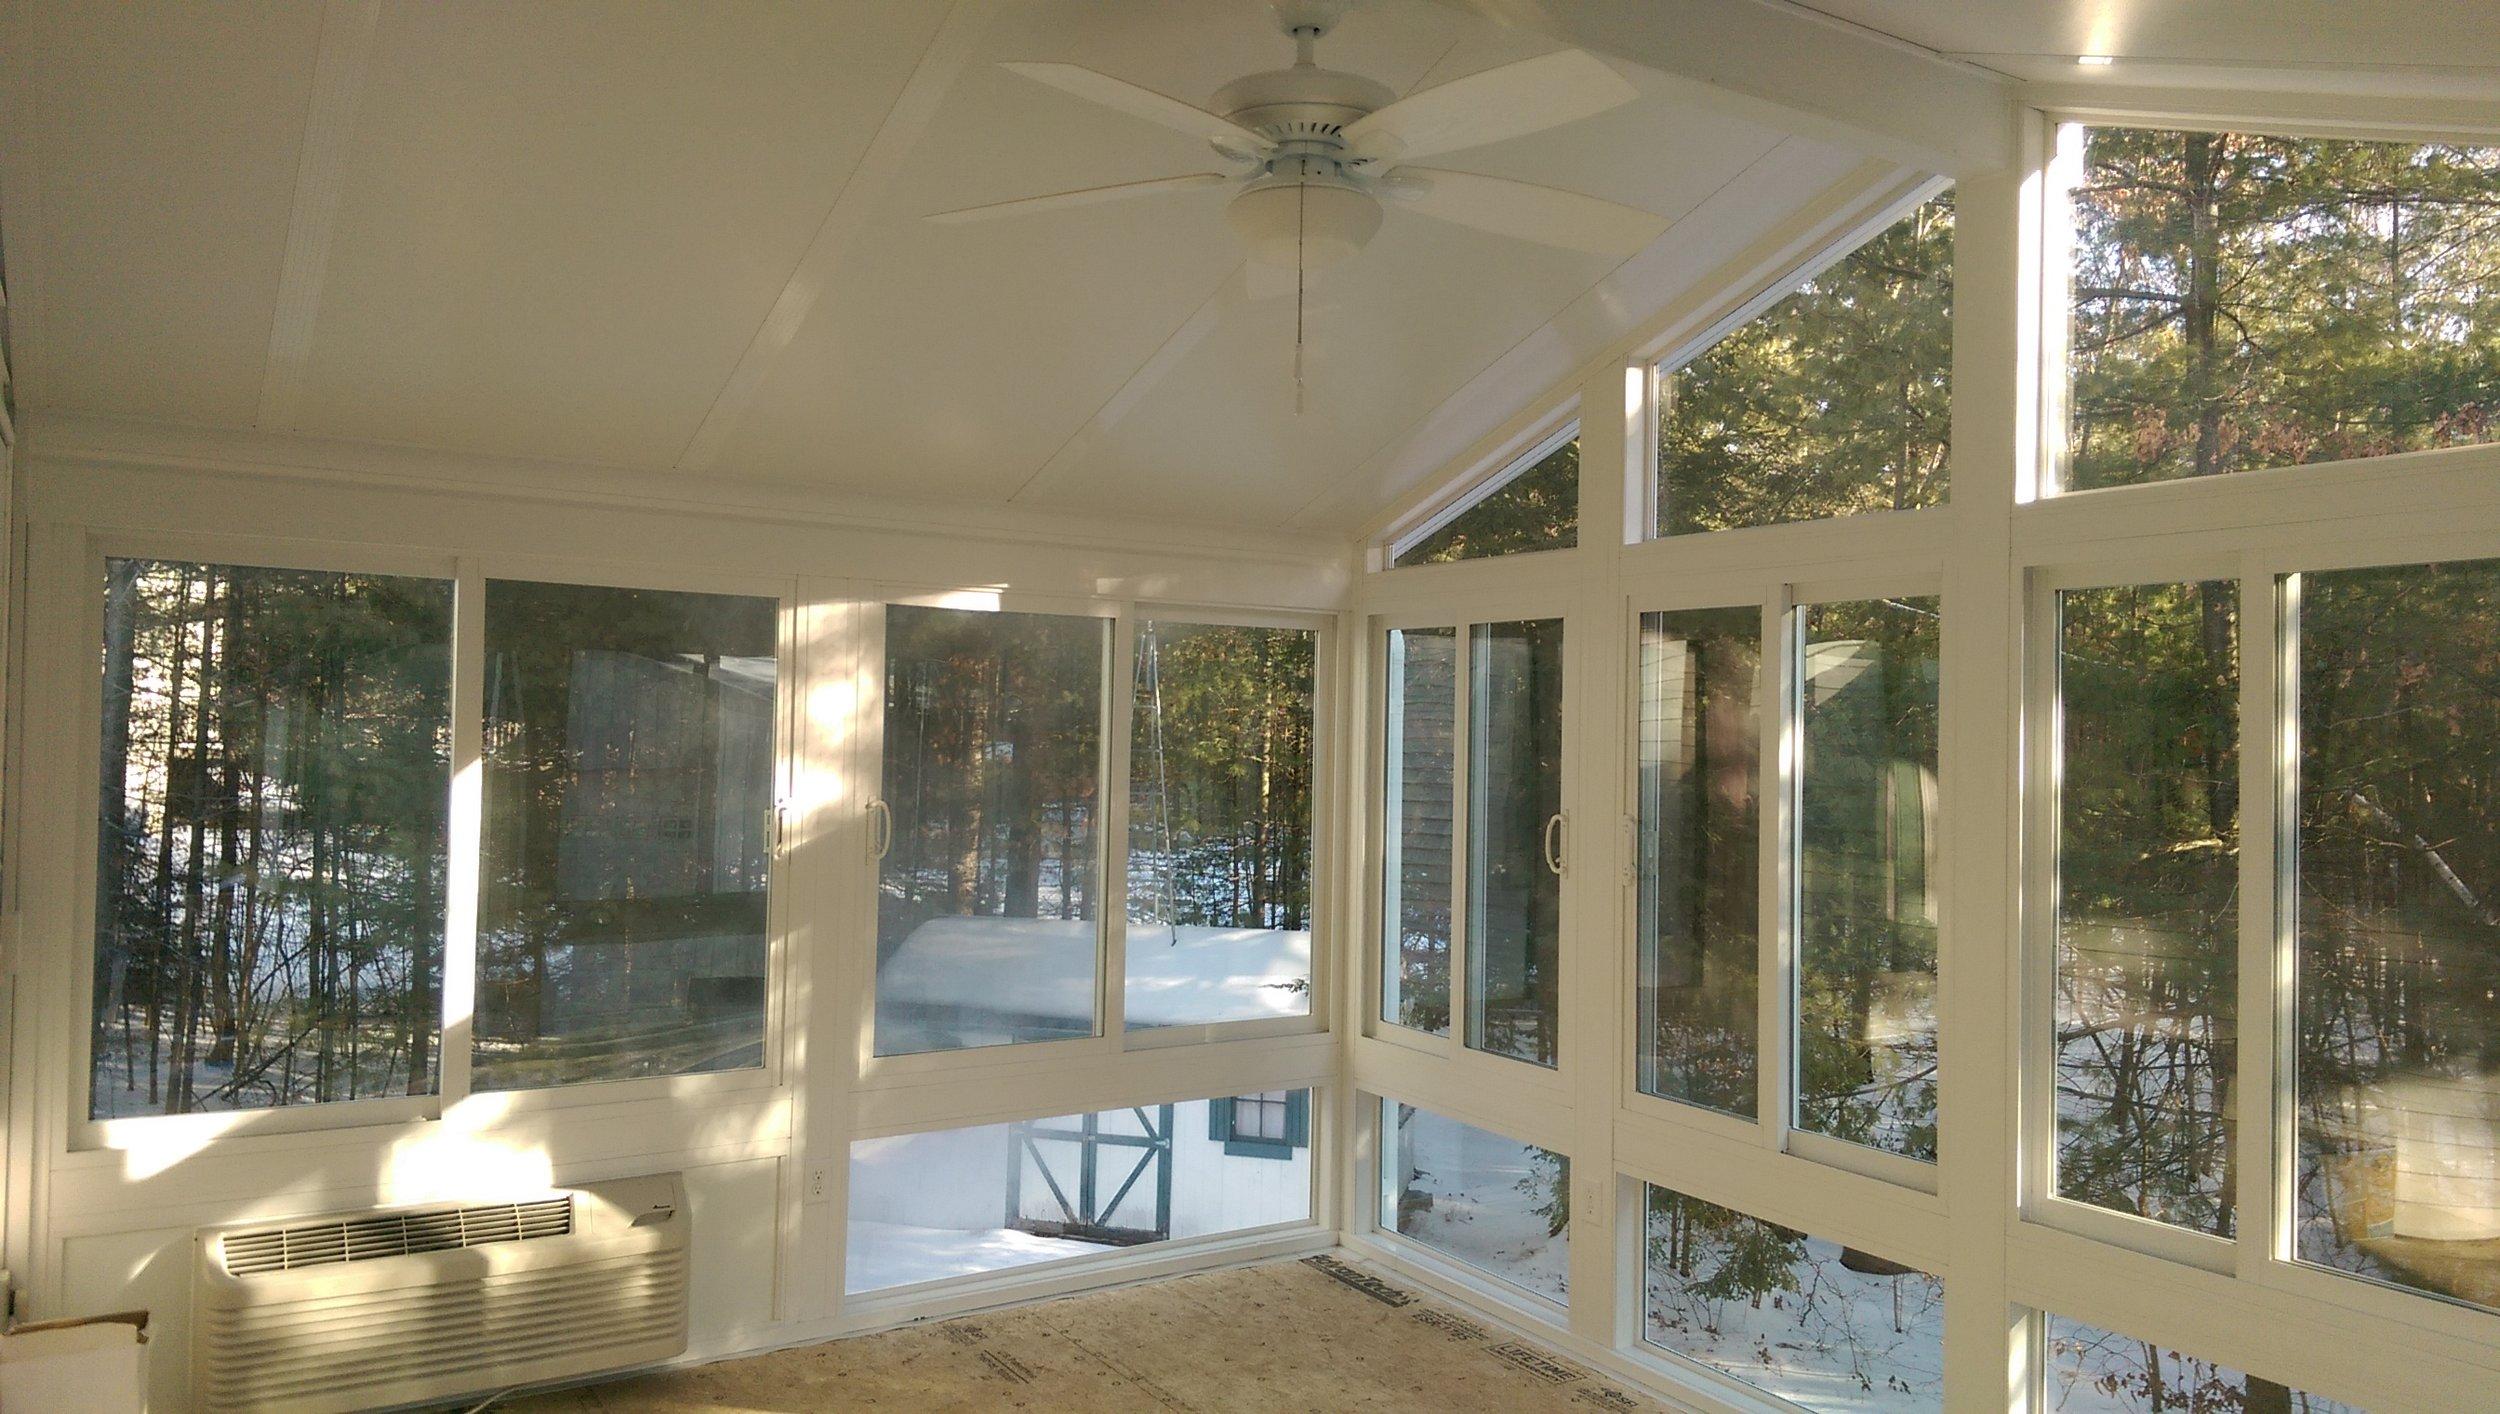 4-Season / Year-round sunroom addition in Litchfield, New Hampshire